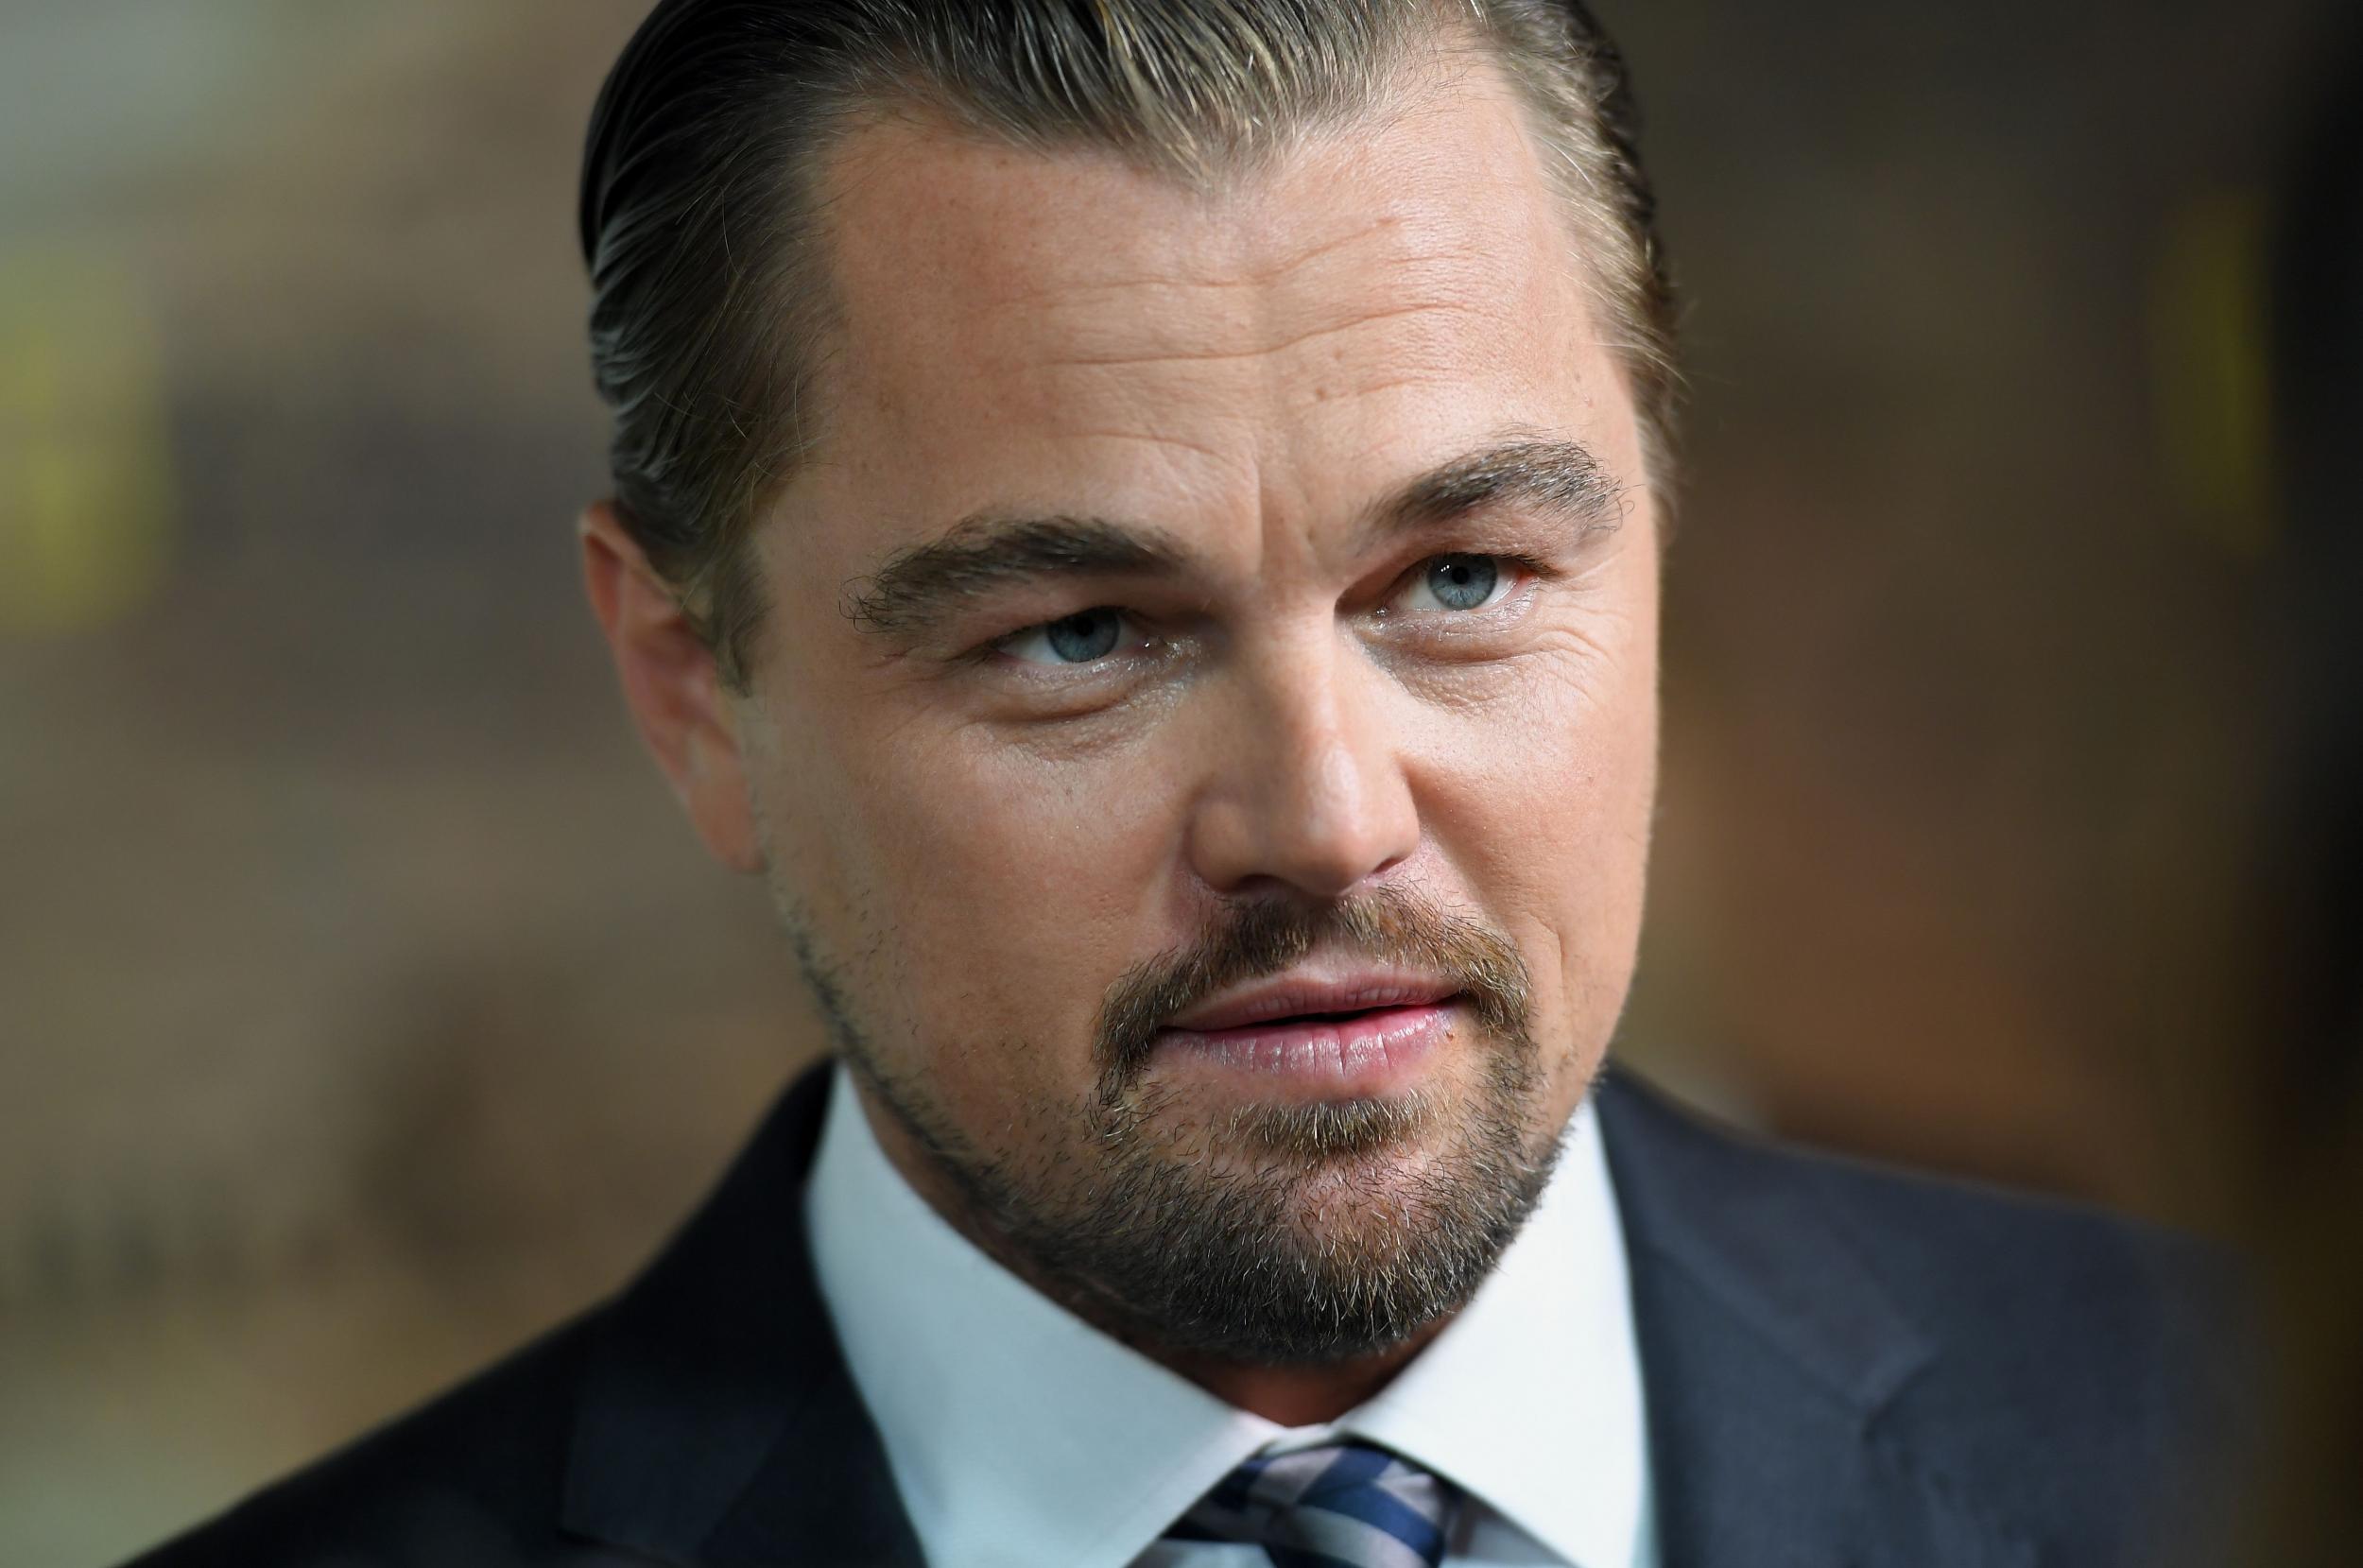 Leonardo DiCaprio amp Model Cami Morrone Are Not Dating